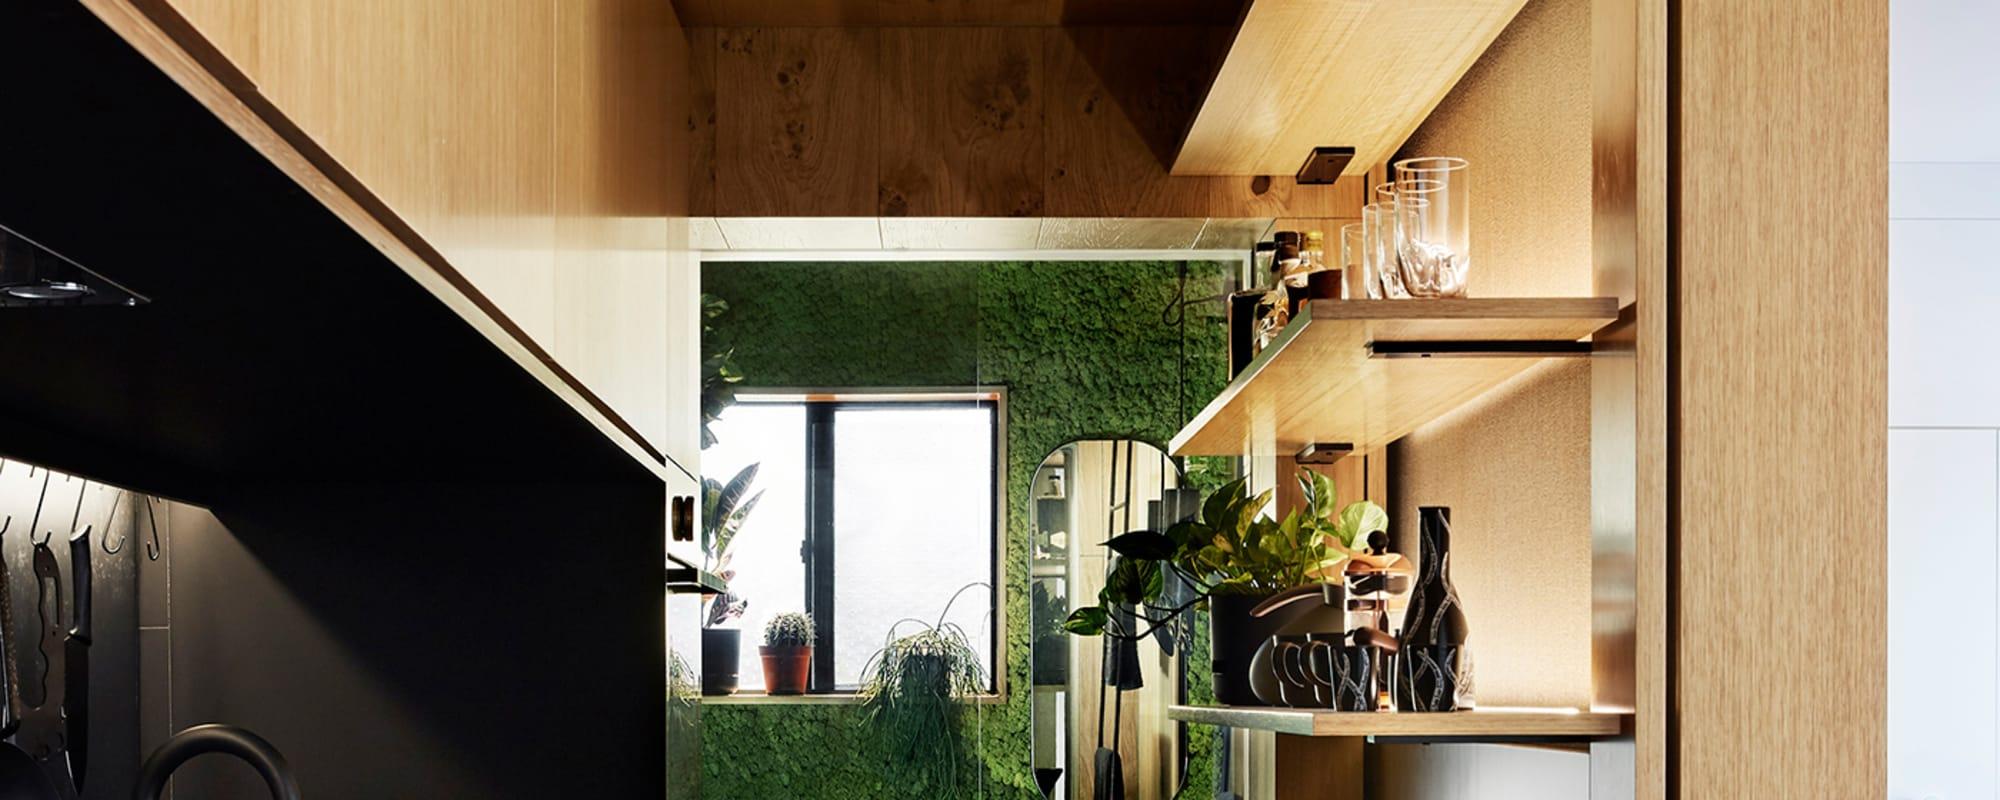 Tsai Design, Type Street Apartment, Eichenholz, Küche, Marmor, Arbeitsplatte, Bad, Microliving